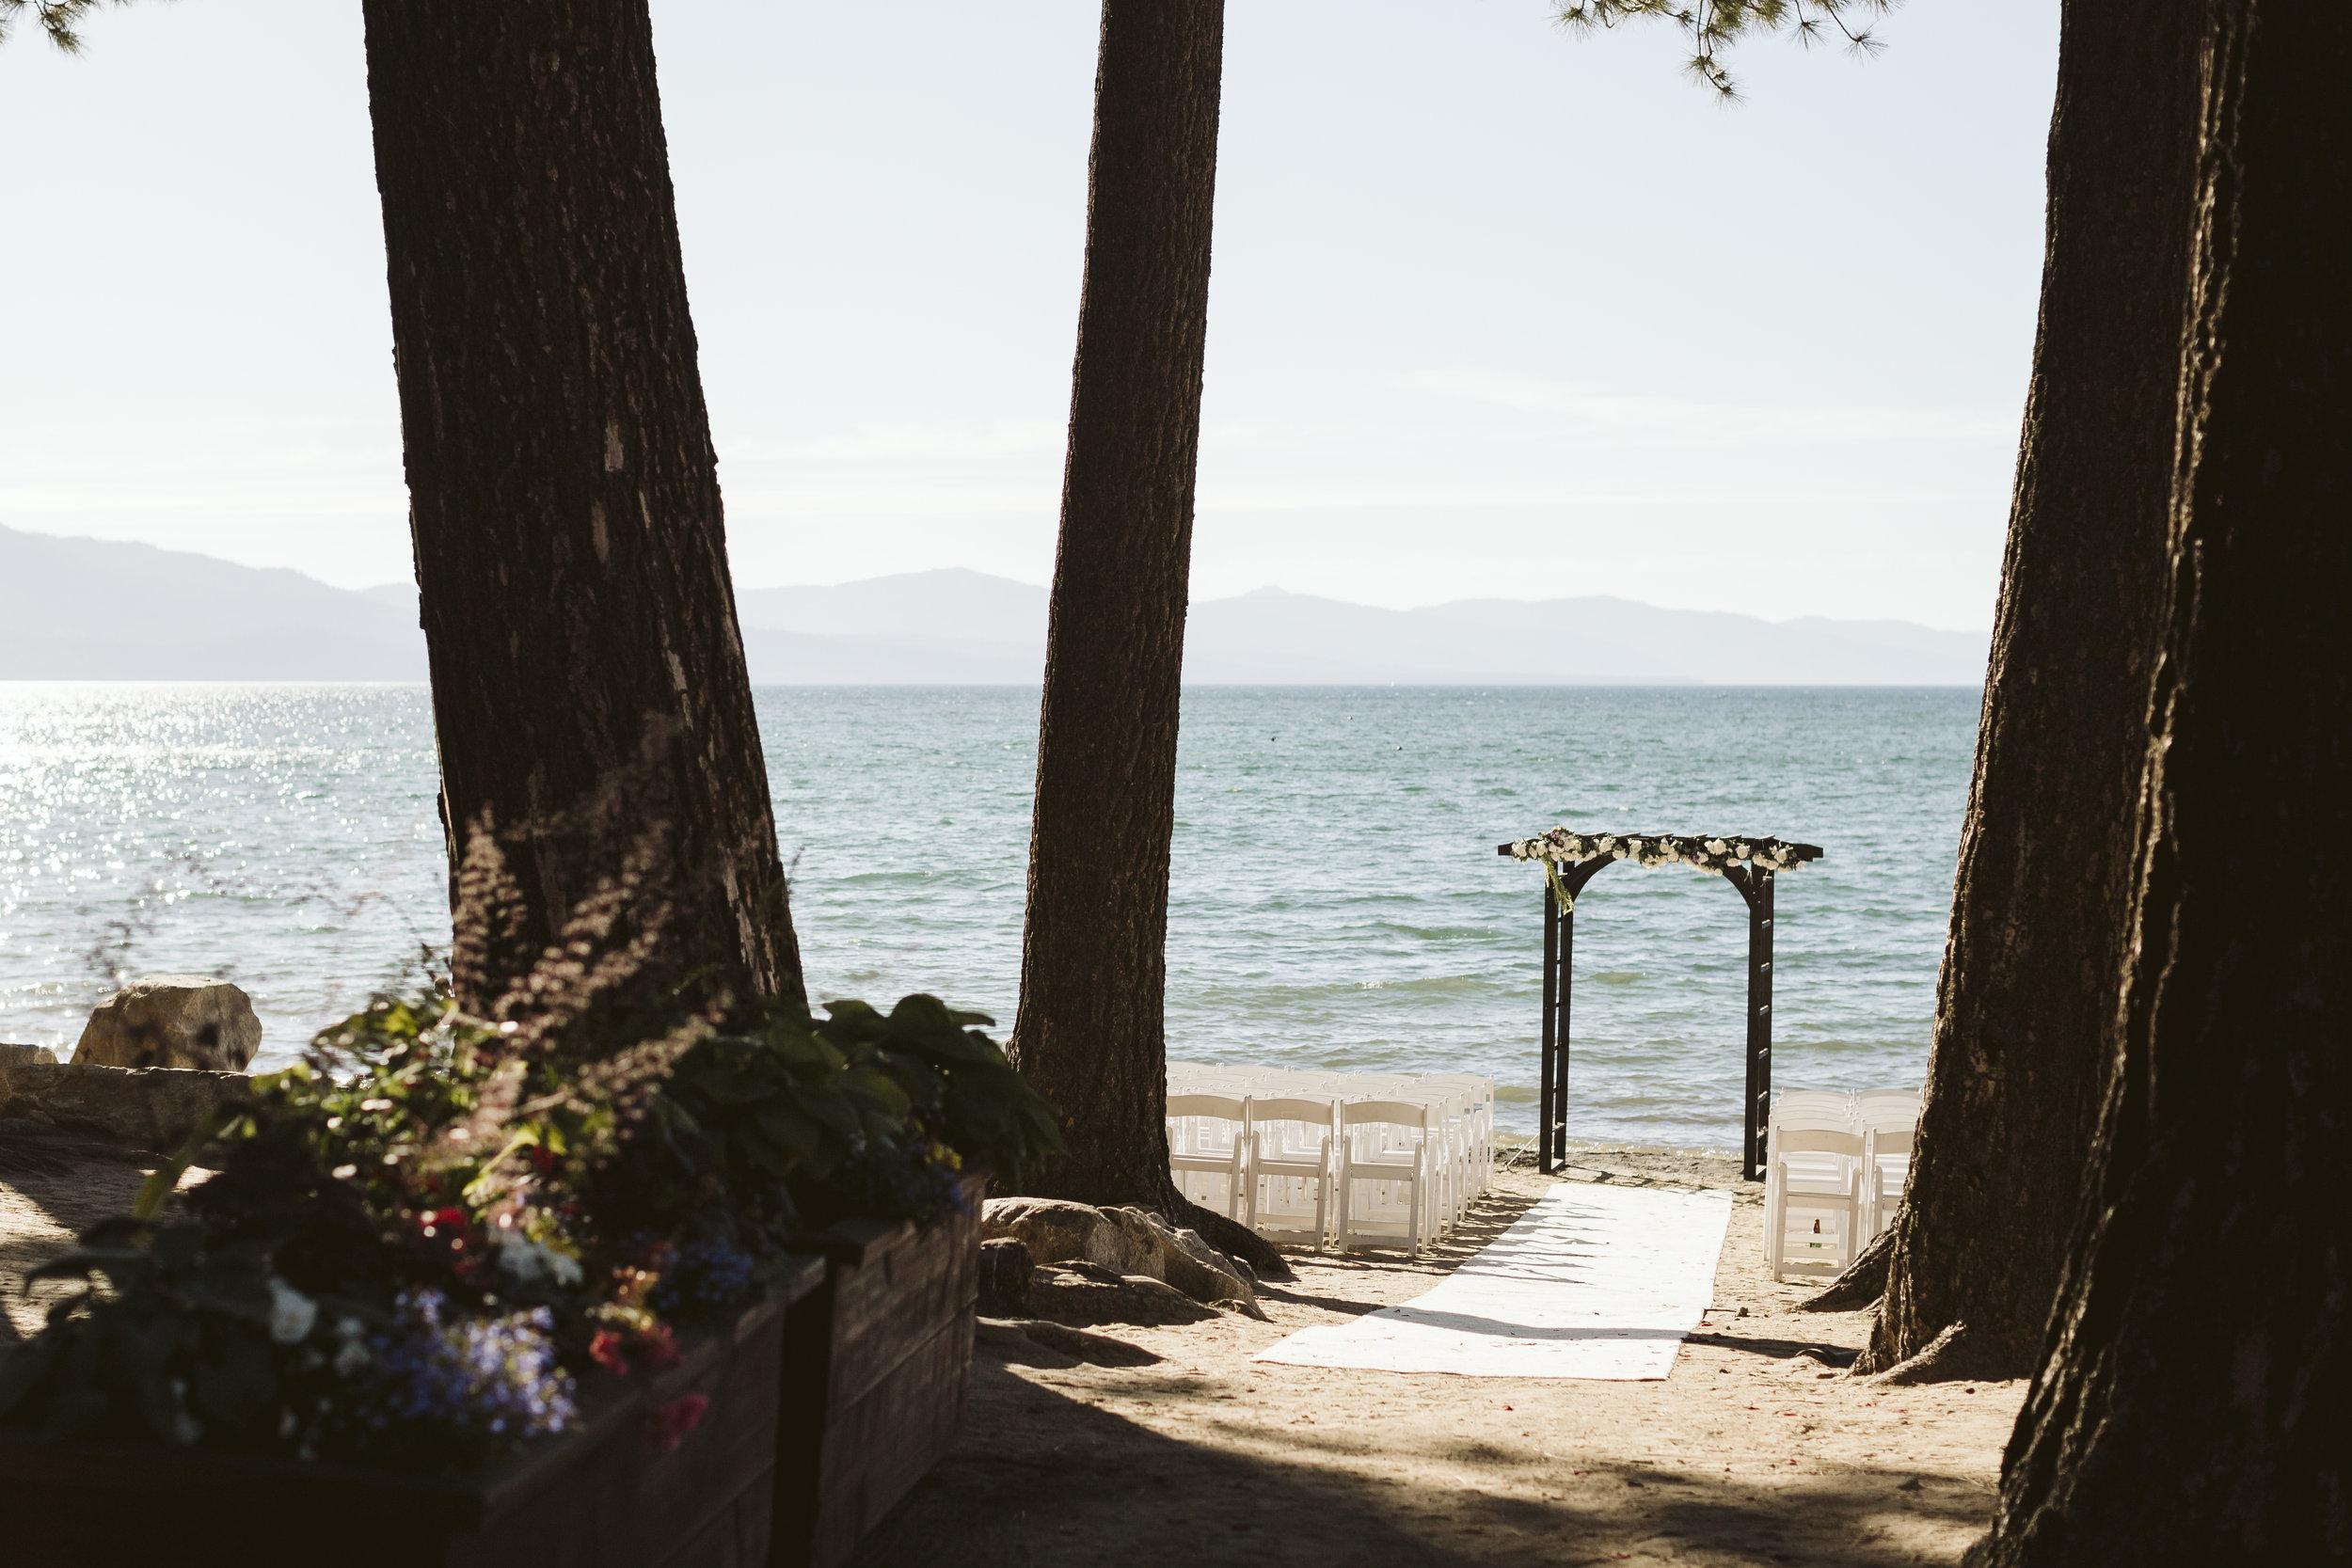 _MG_3743vildphotography-adventurewedding-tahoewedding-tahoeweddings-laketahoeweddingphotographer-californiawedding-shelly-cody.jpg